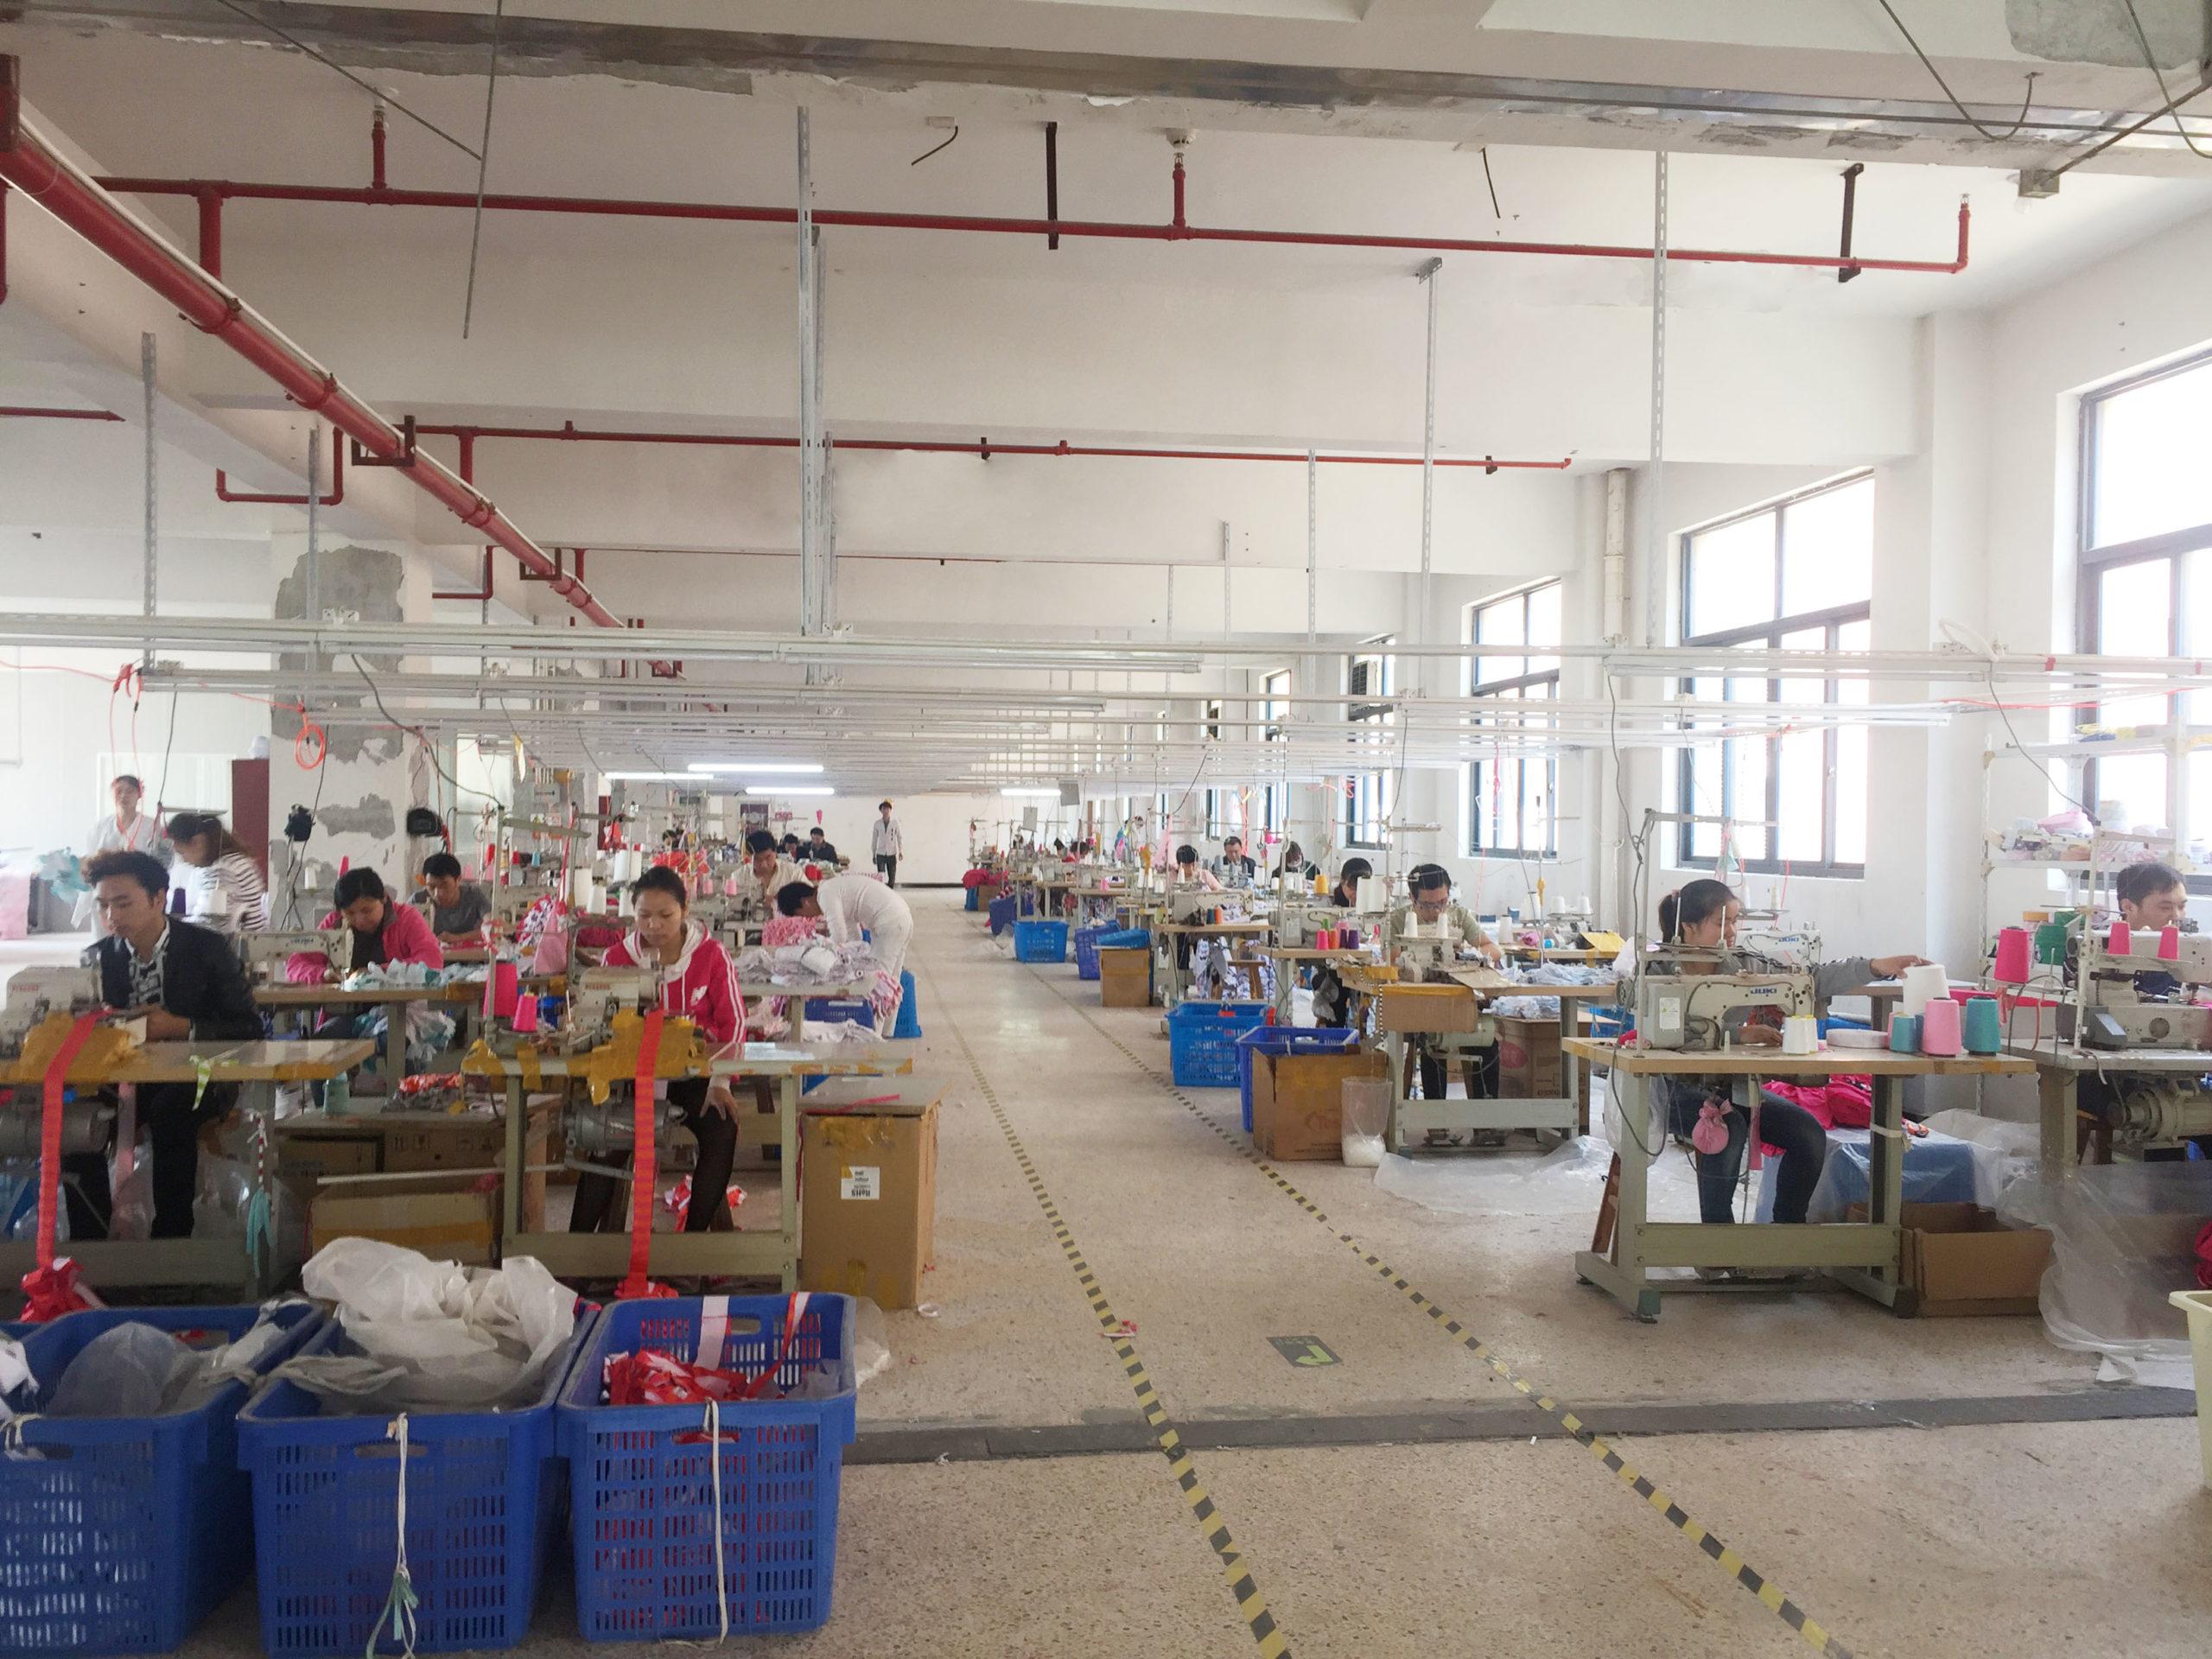 2020 Girls' Clothing Sets Kids Clothing Manufacturers Overseas Wholesale Baby Girls Summer Shorts Sets Girls Sunflower Clothing